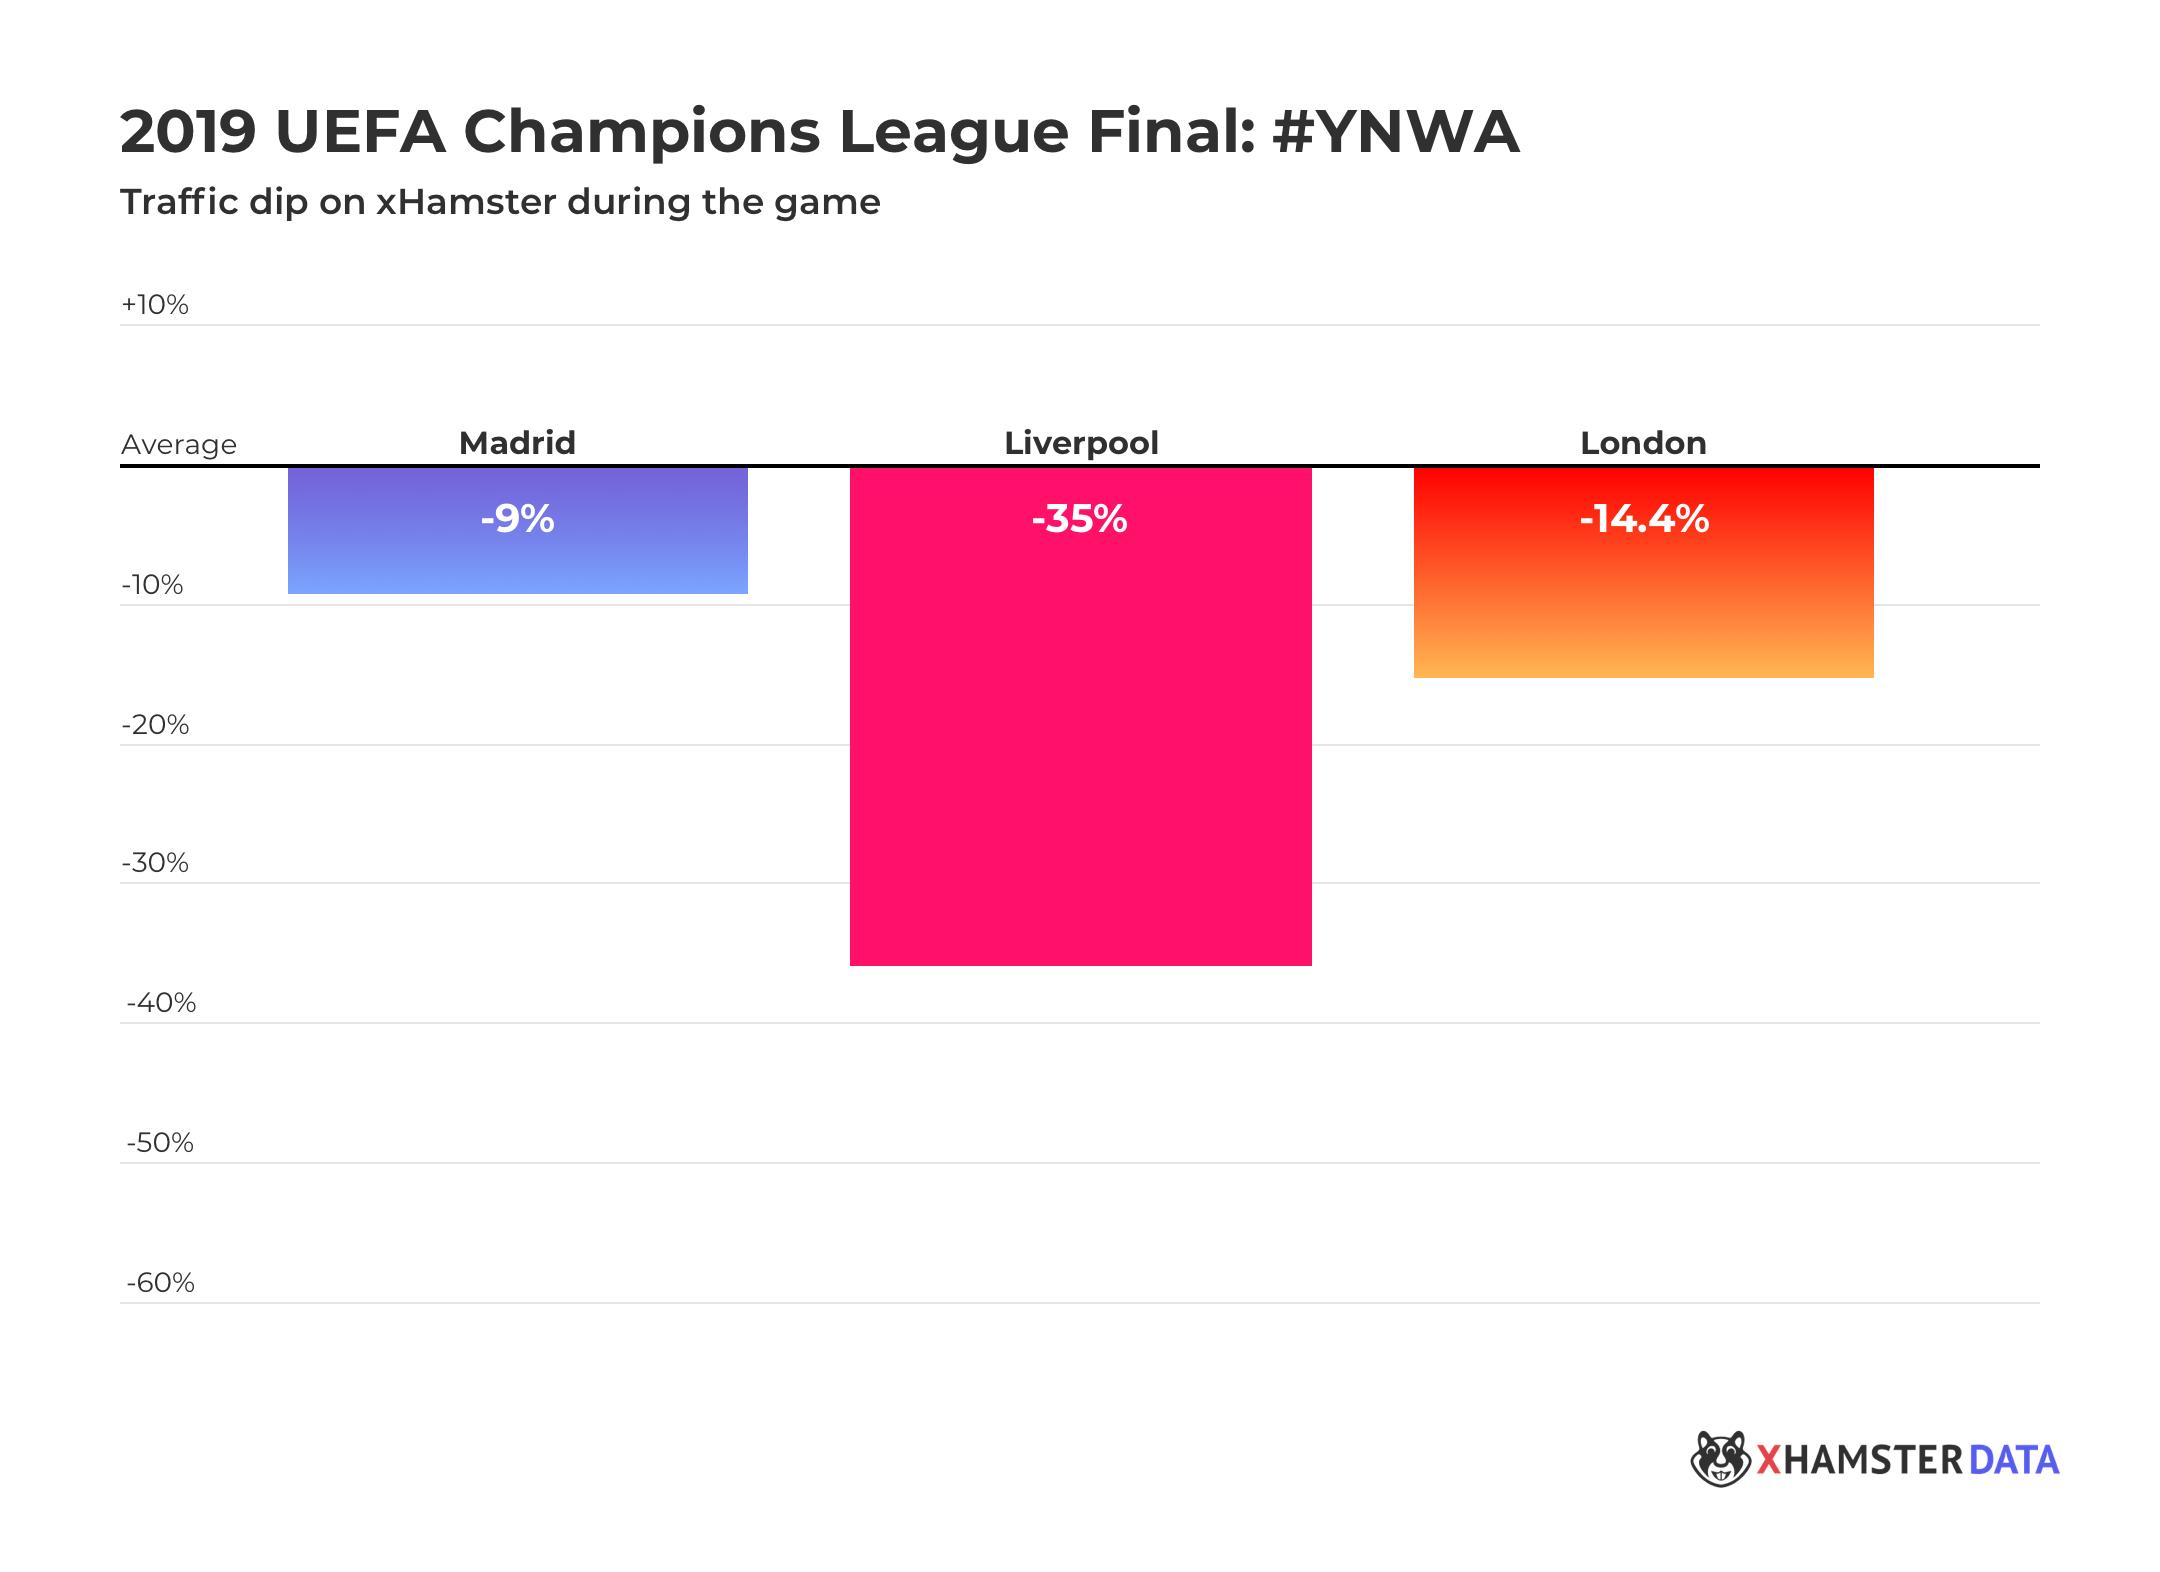 Champions League Final 2019: YNWA